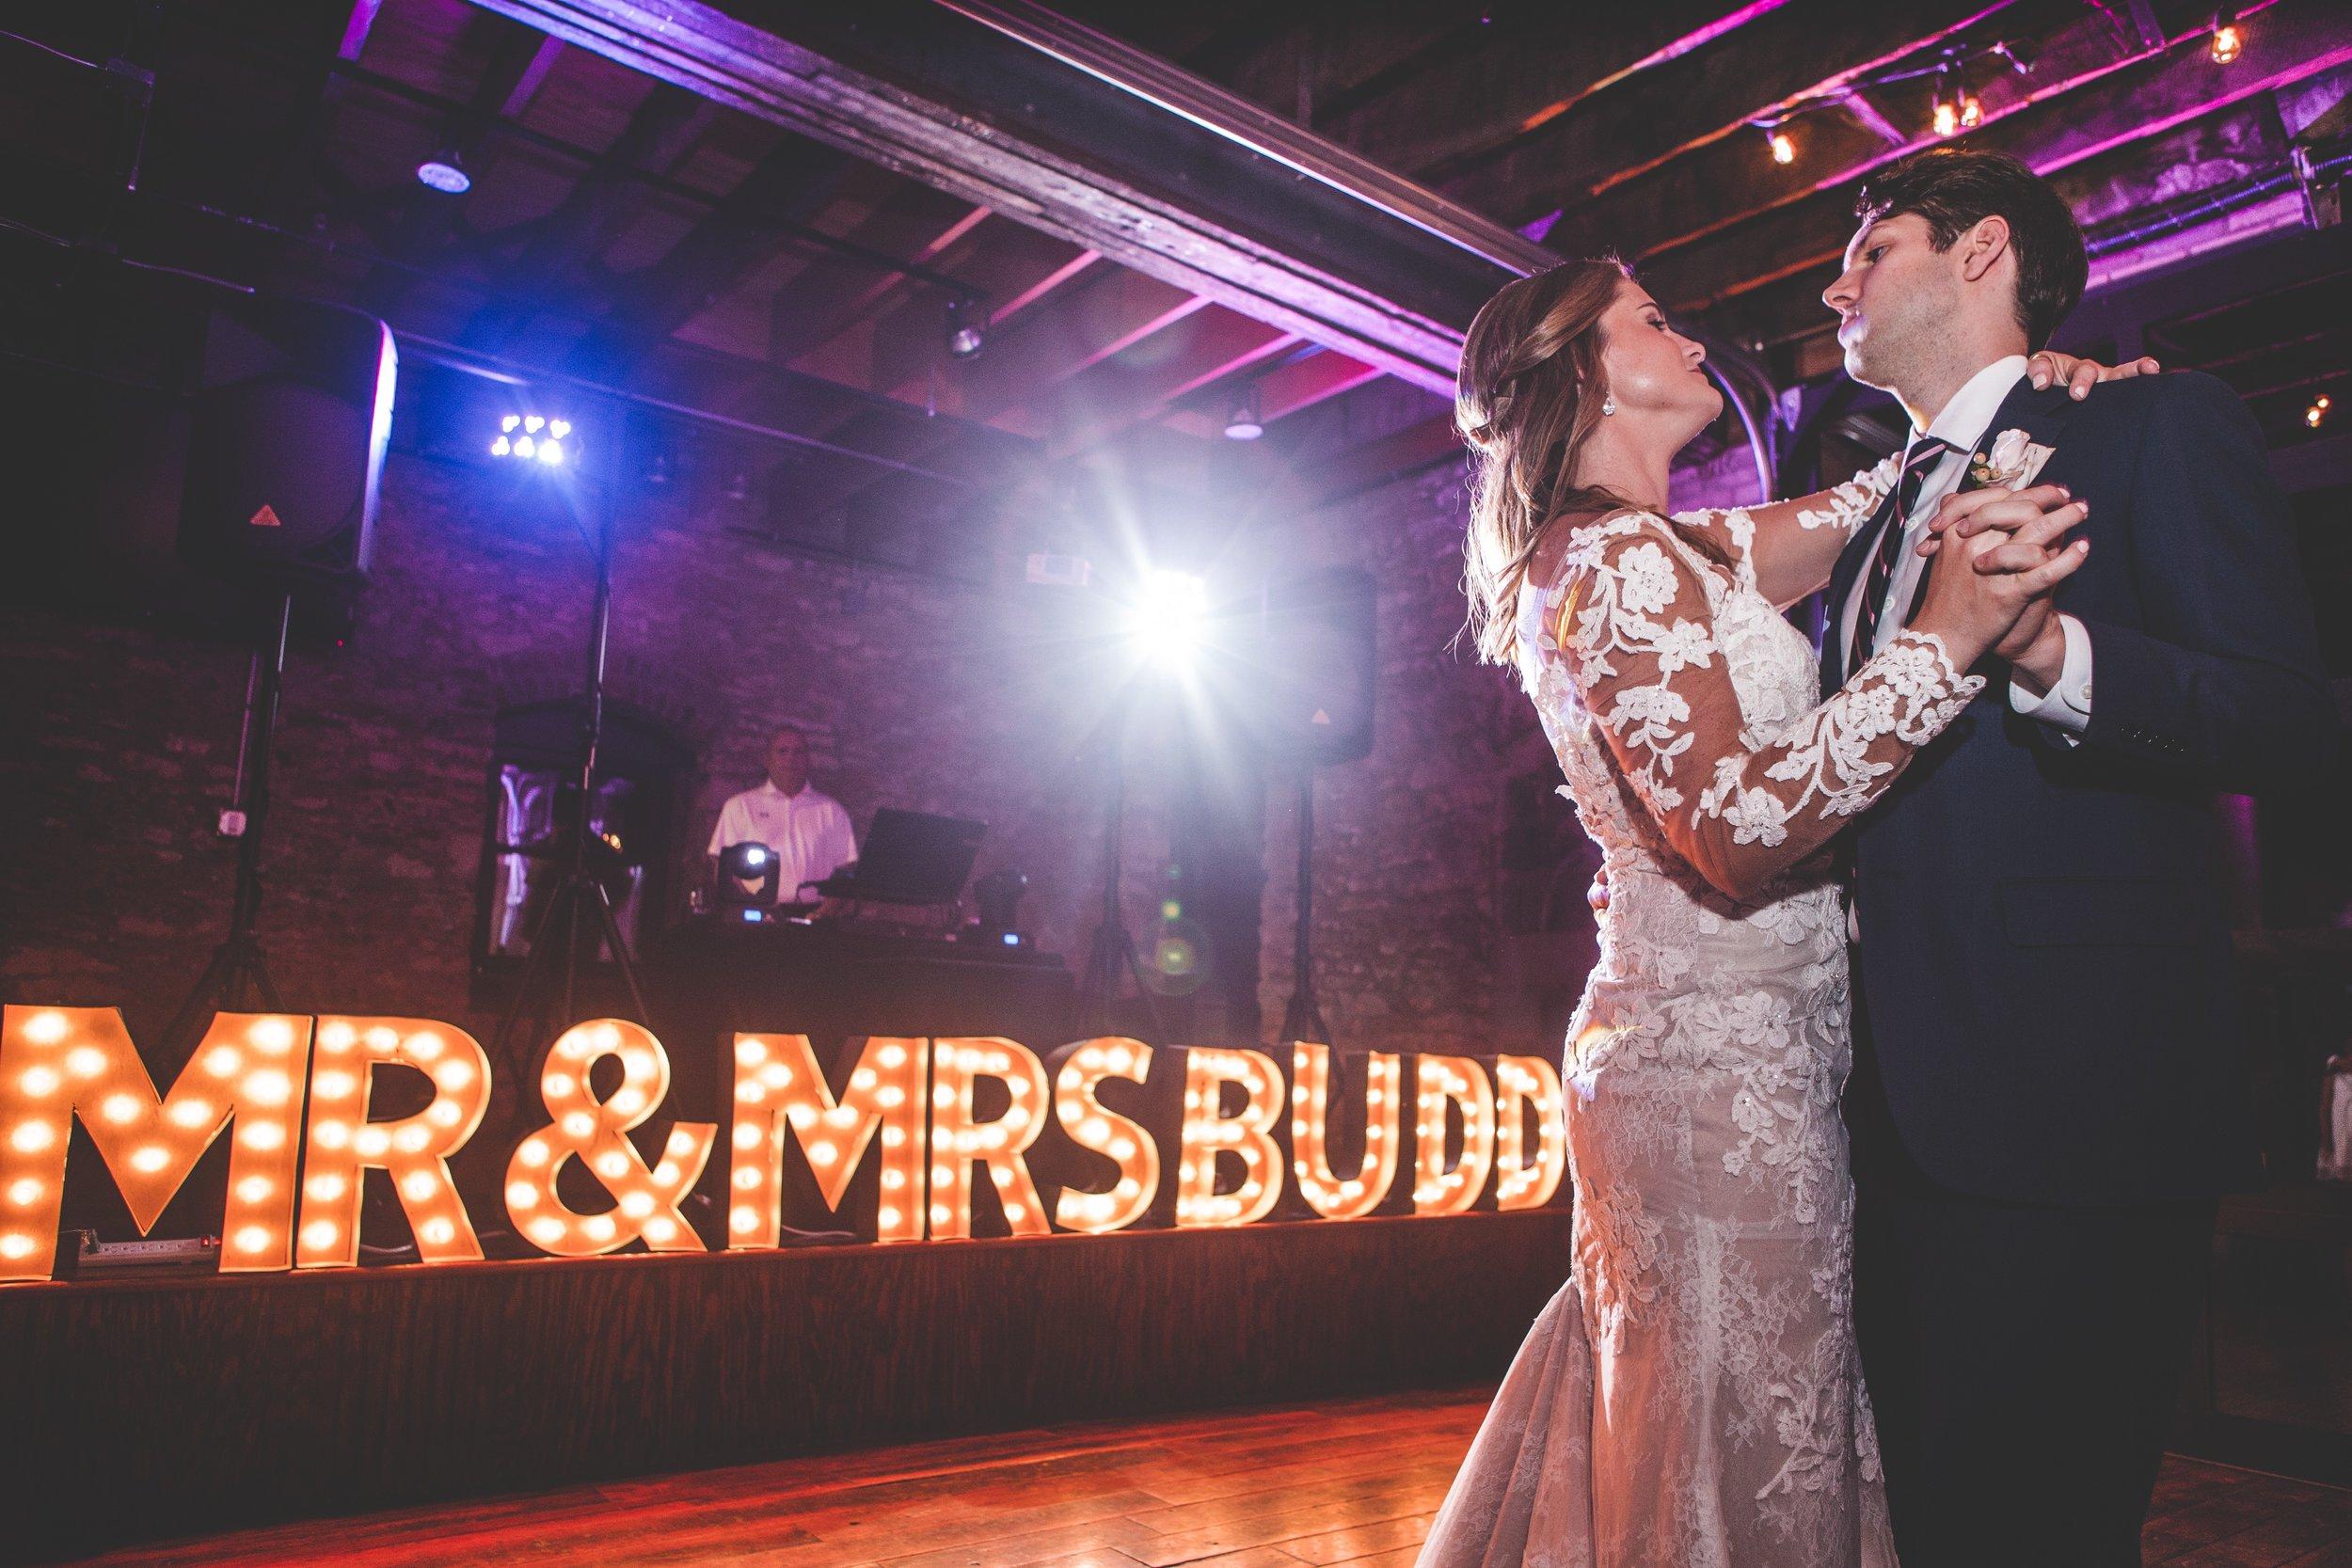 cider-gallery-lawrence-ks-wedding-photographer-jason-domingues-photography-lindsey-paul-blog-0042.jpg